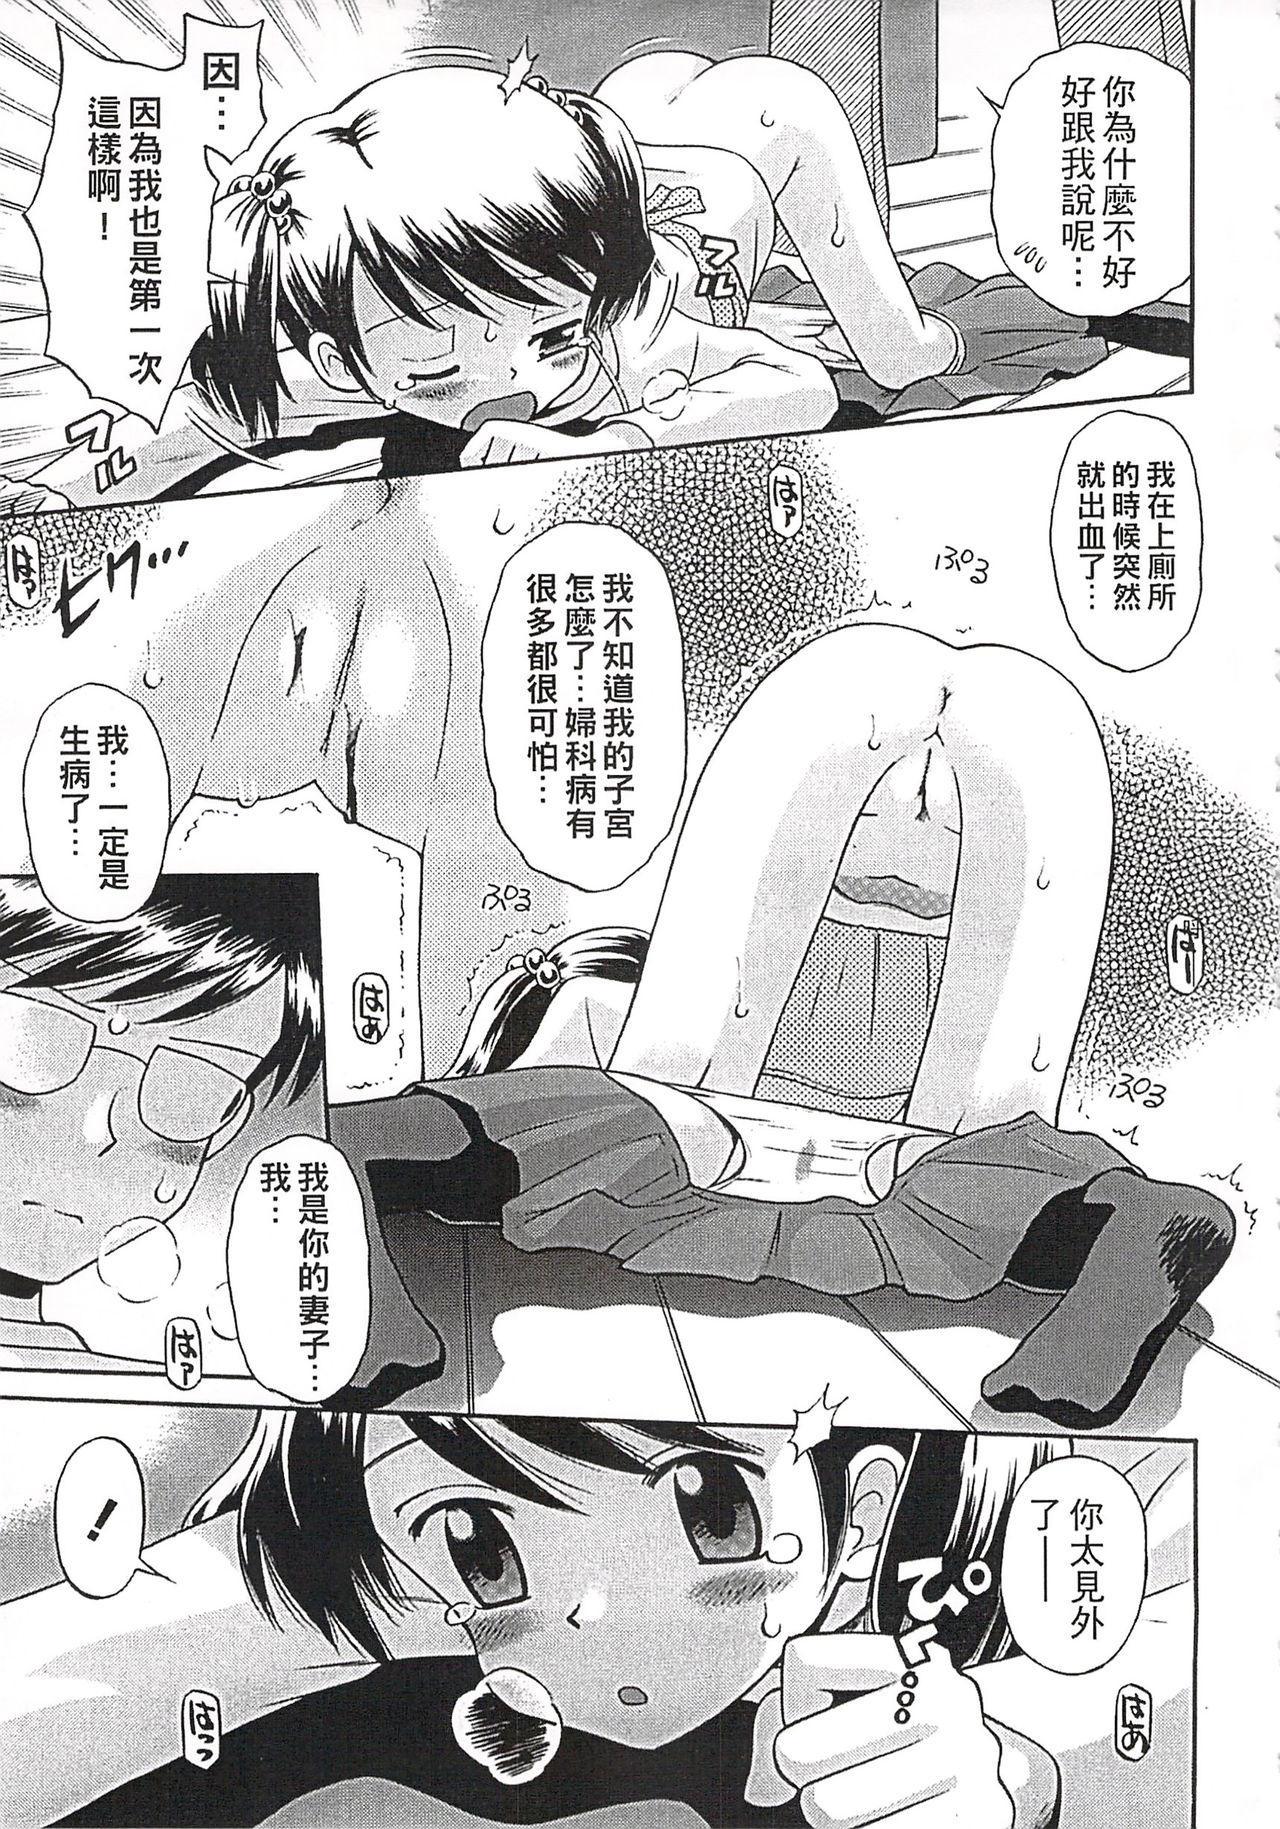 Kore demo Otona Desu Kedo!? Mrs.LOLITA Kanzenban   人家是大人啦! ~Mrs.LOLITA完全版 68